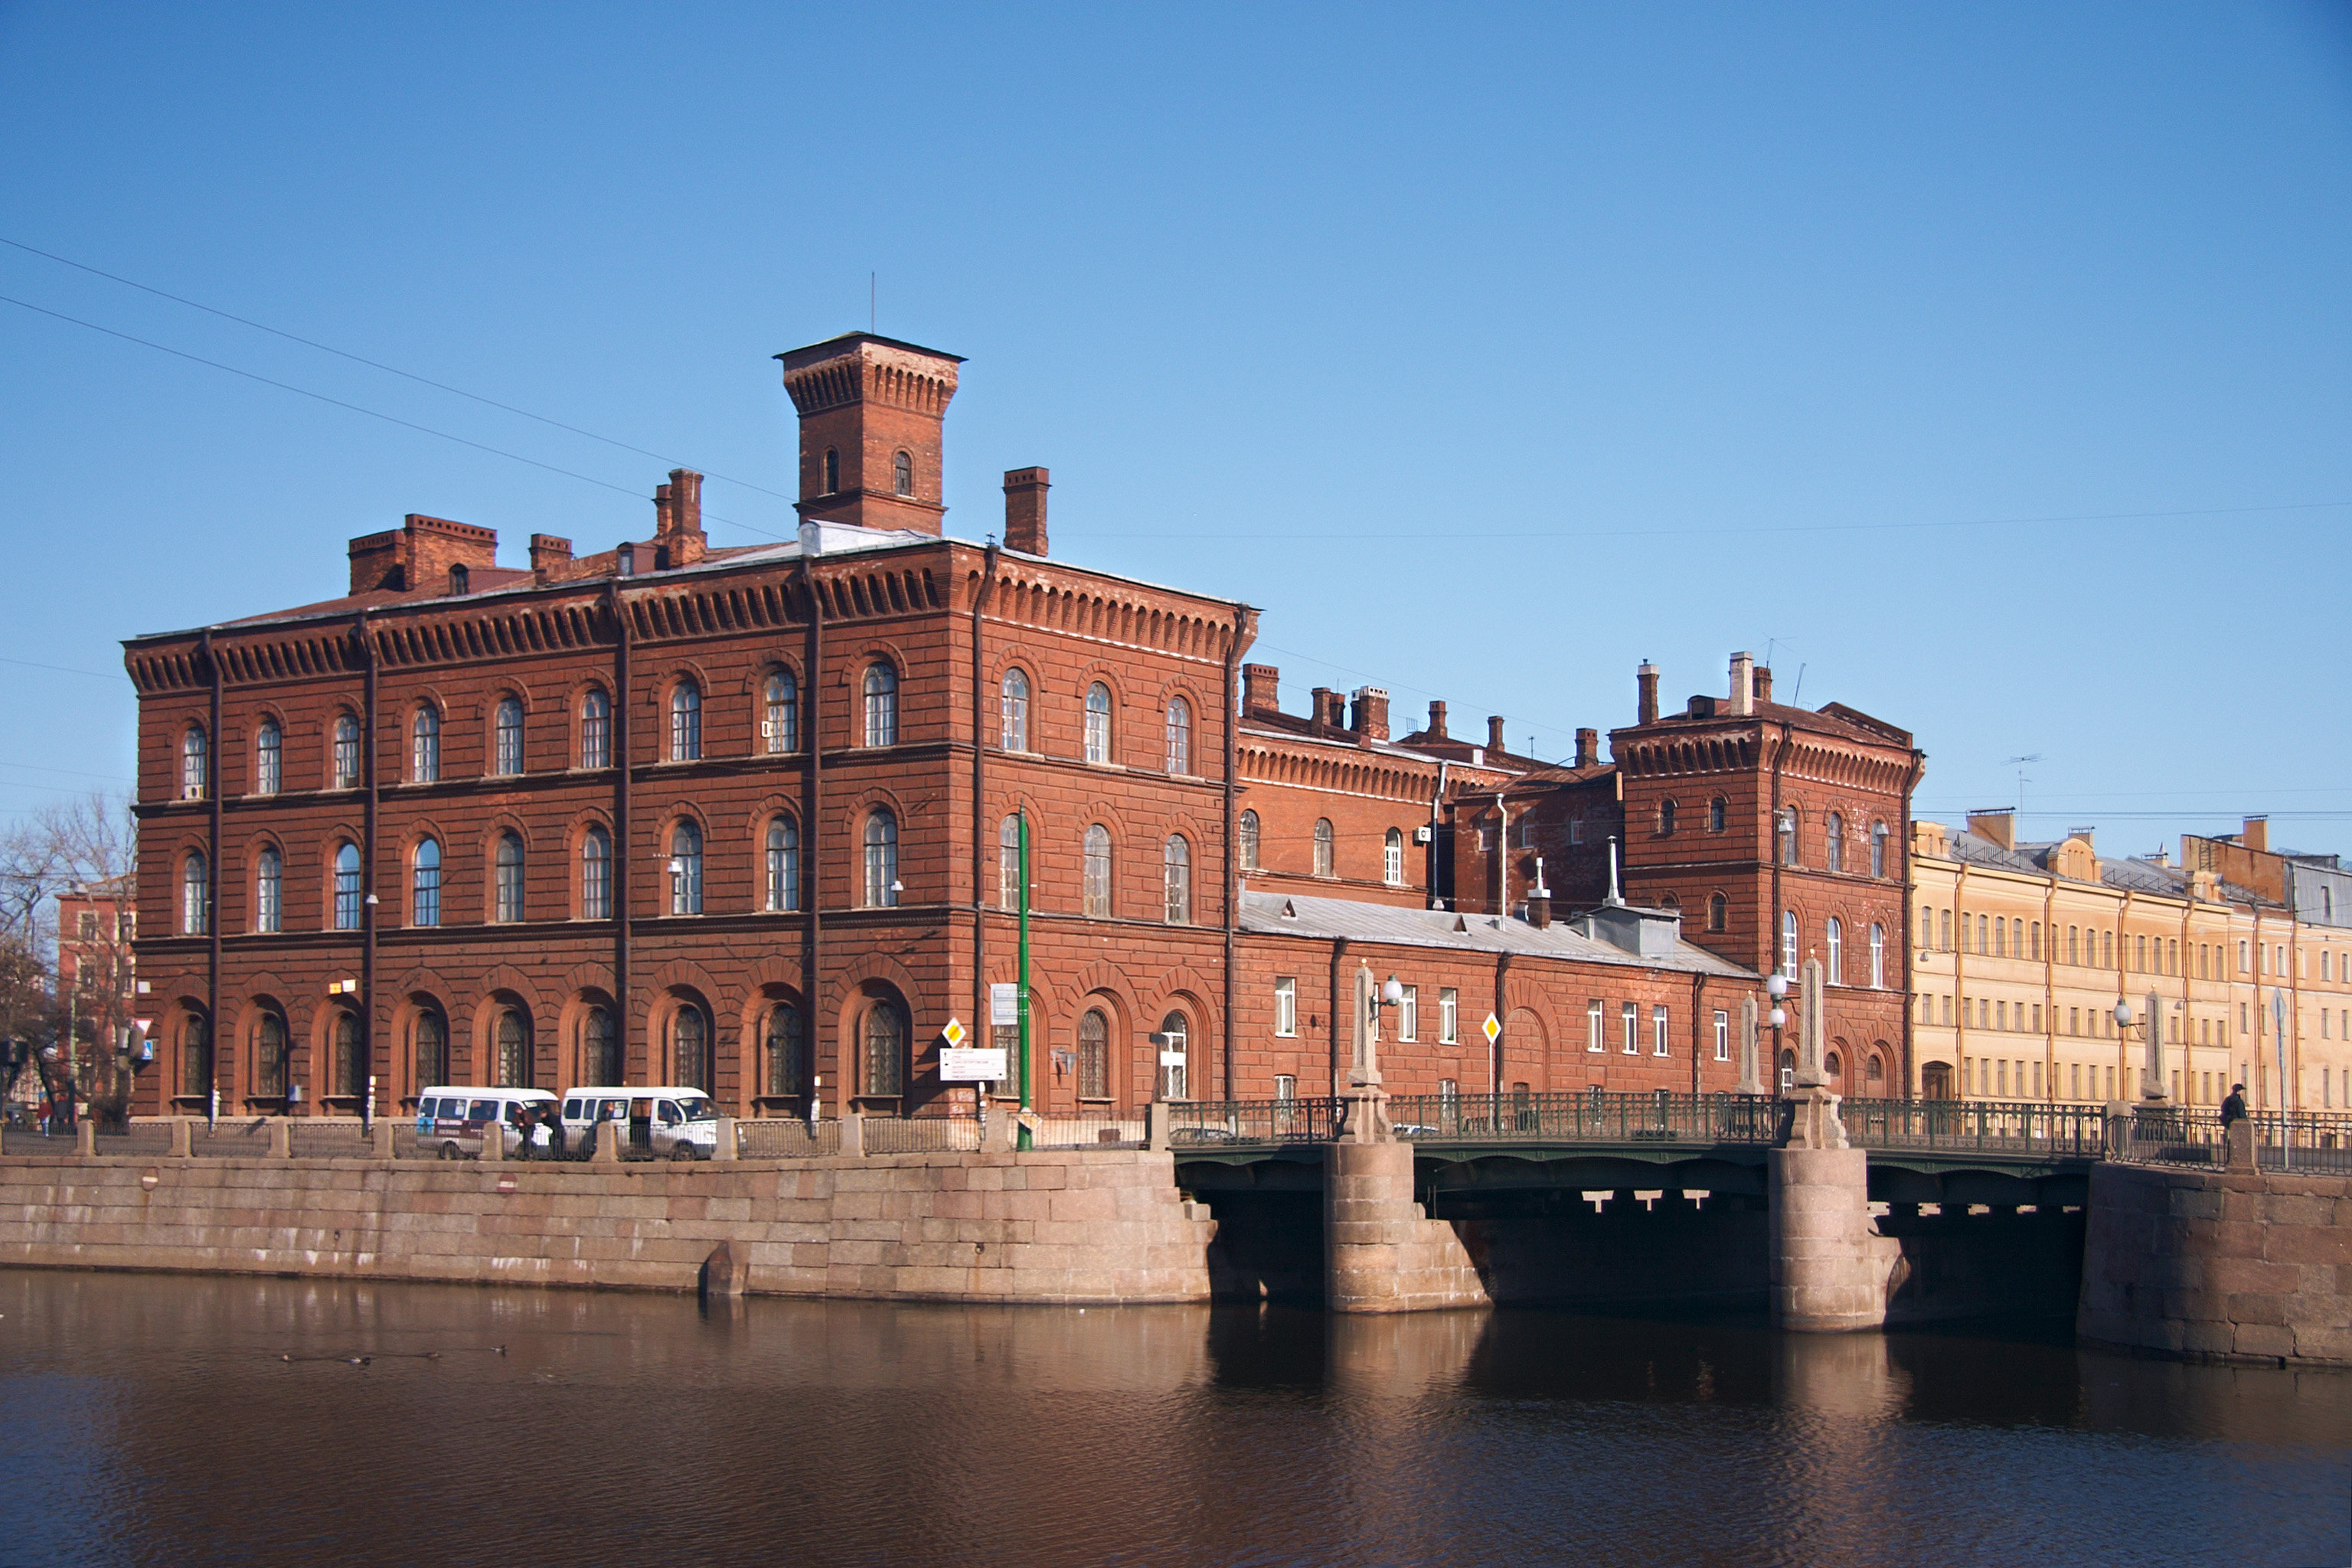 File:Malo-Kalinkin Bridge in Saint Petersburg with a Building.jpg